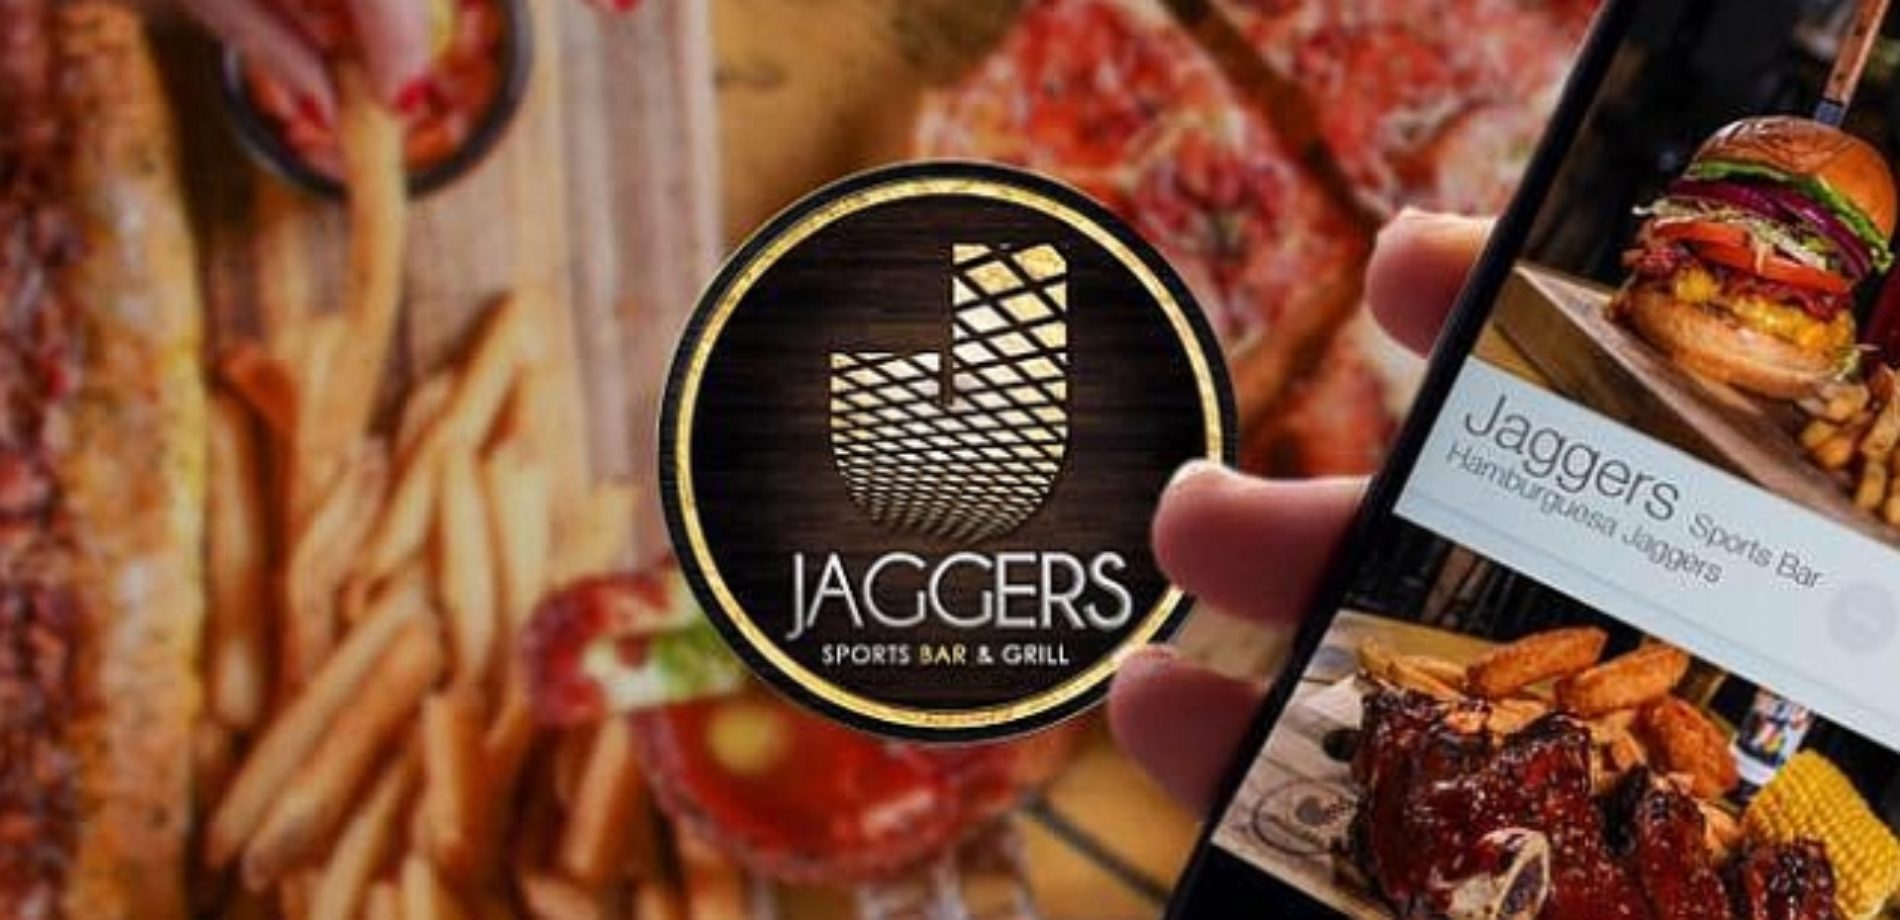 Jaggers Winguiza en Tijuana 2018